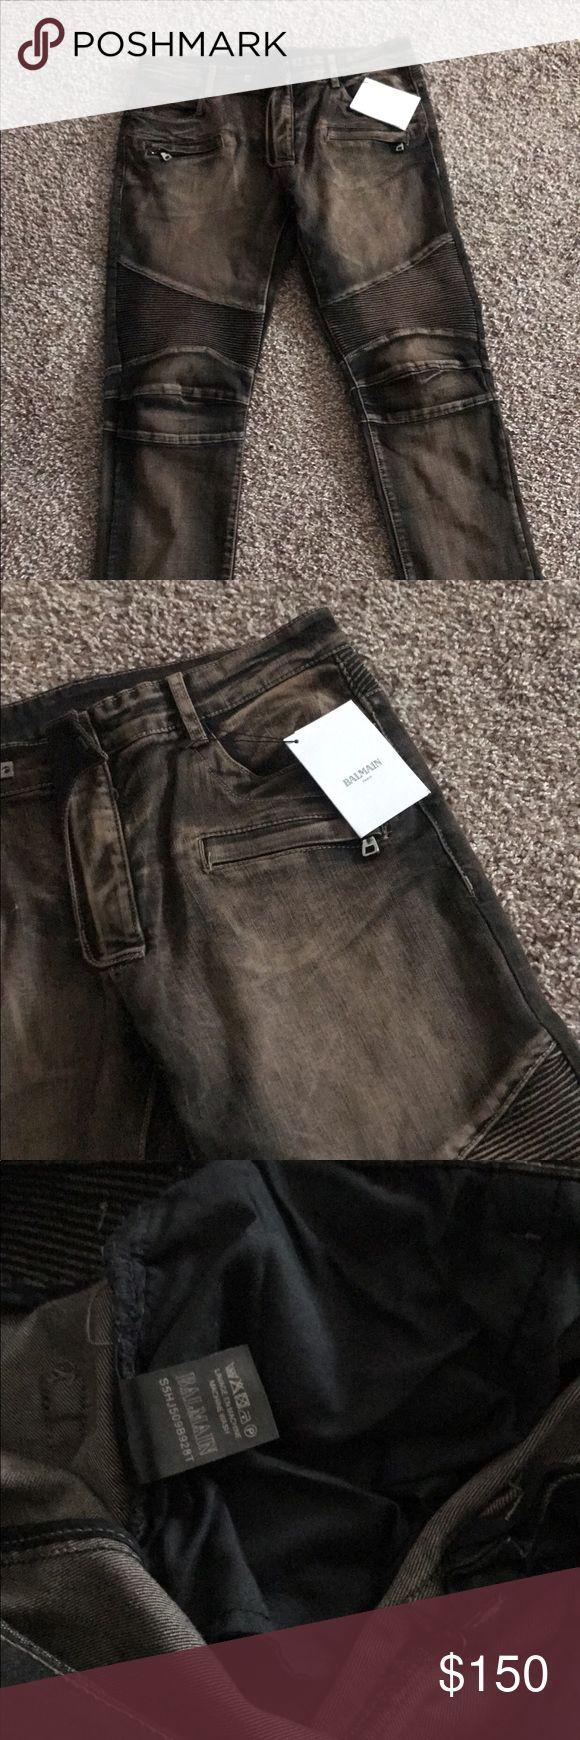 Balmain jeans Balmain jean 3 left Balmain Jeans Straight